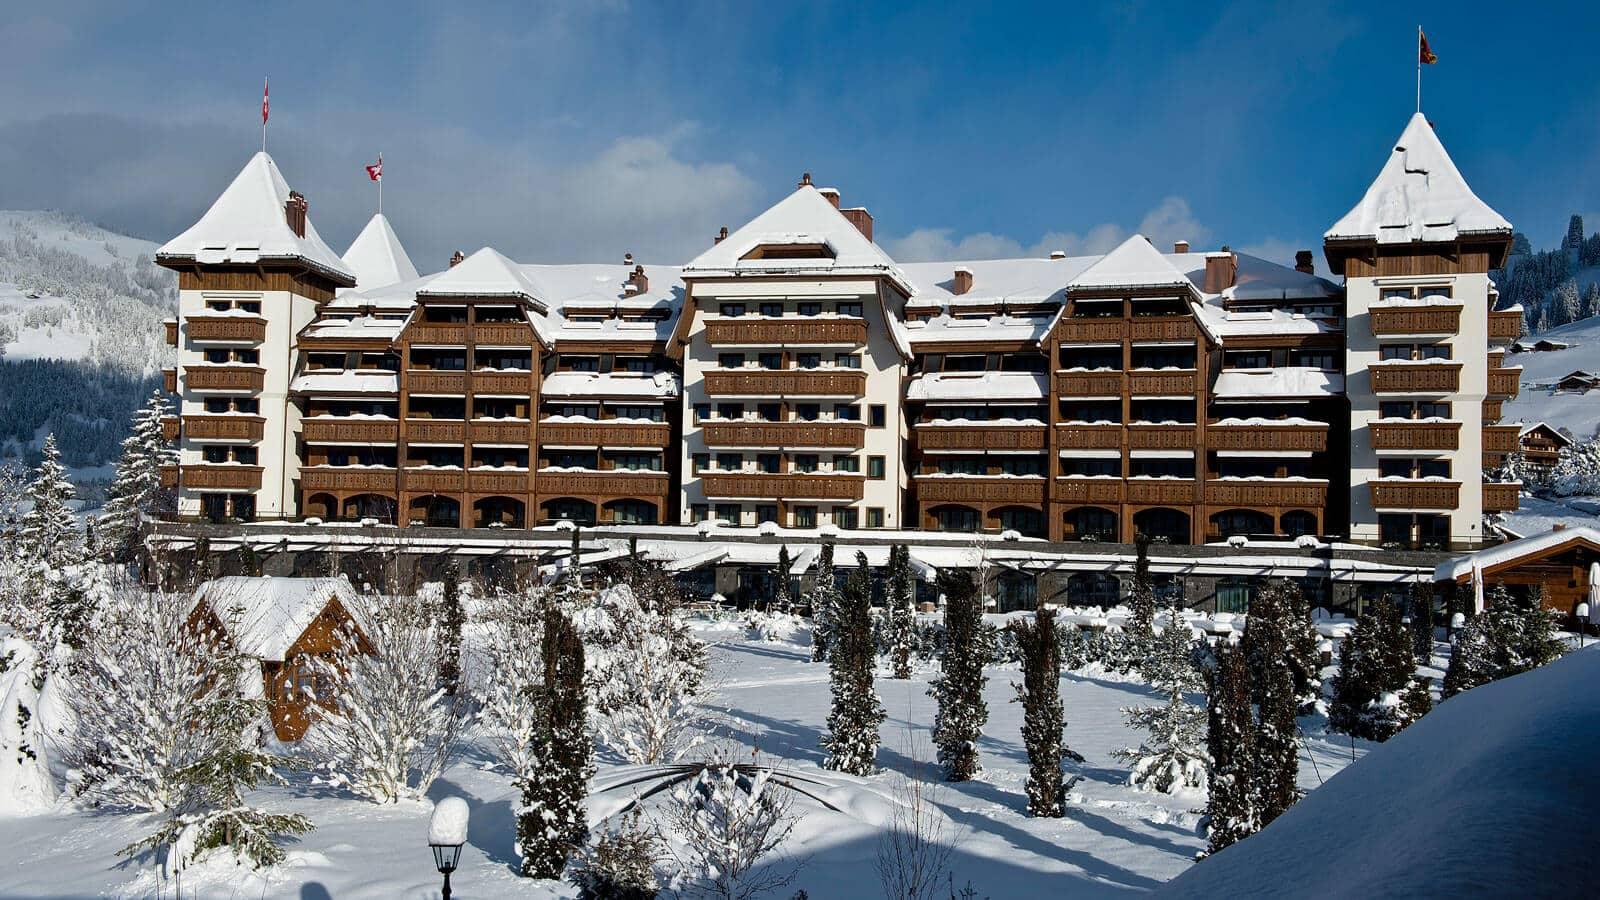 The-Alpina-Gstaad-Lionel-Meylan-Horlogerie-Joaillerie-Vevey